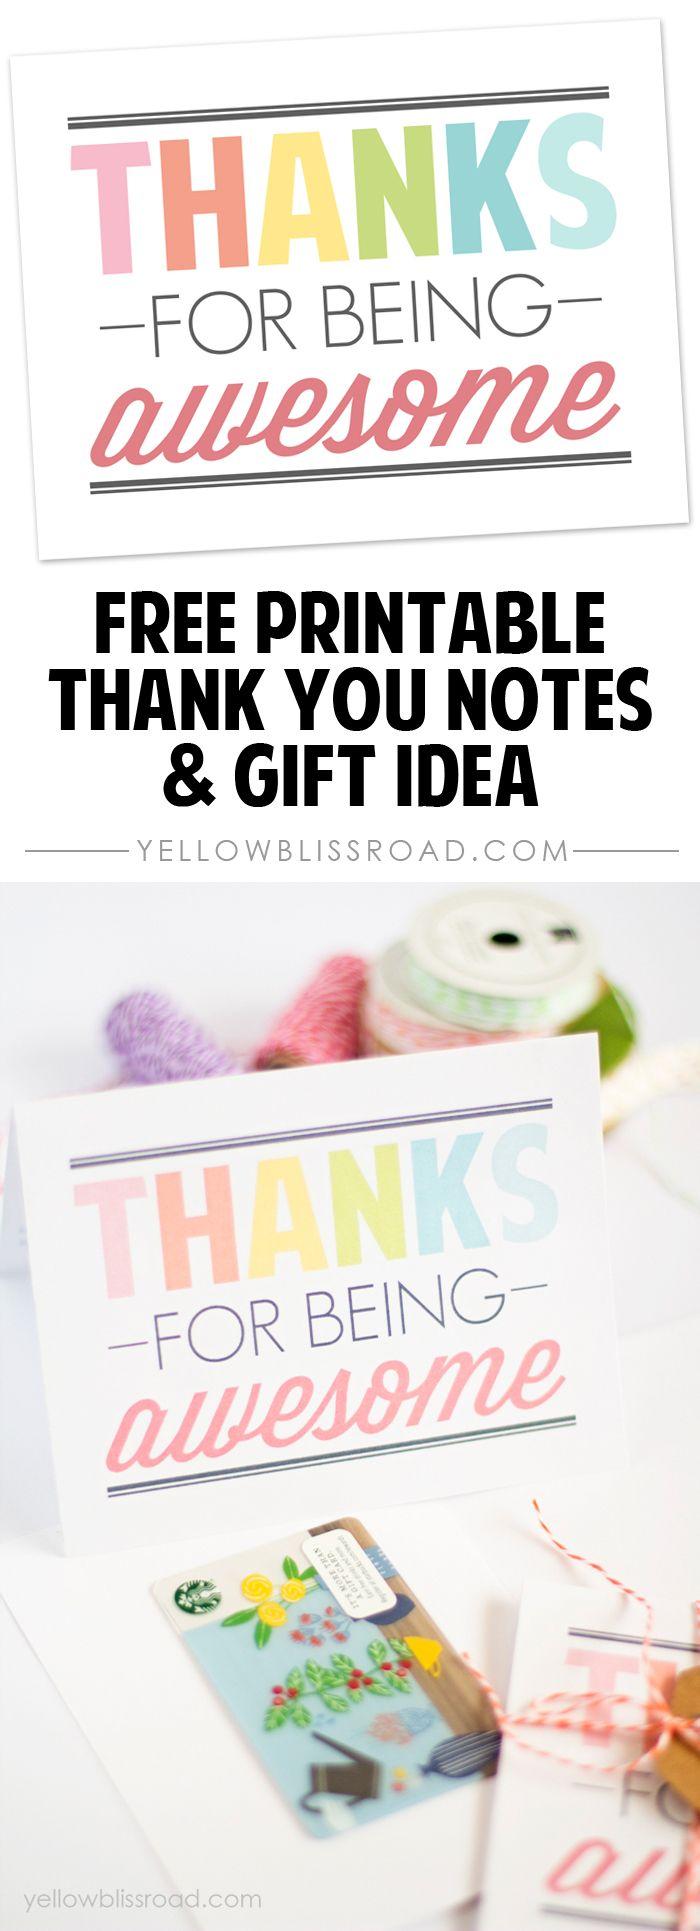 free printable thank you notes  printable thank you notes